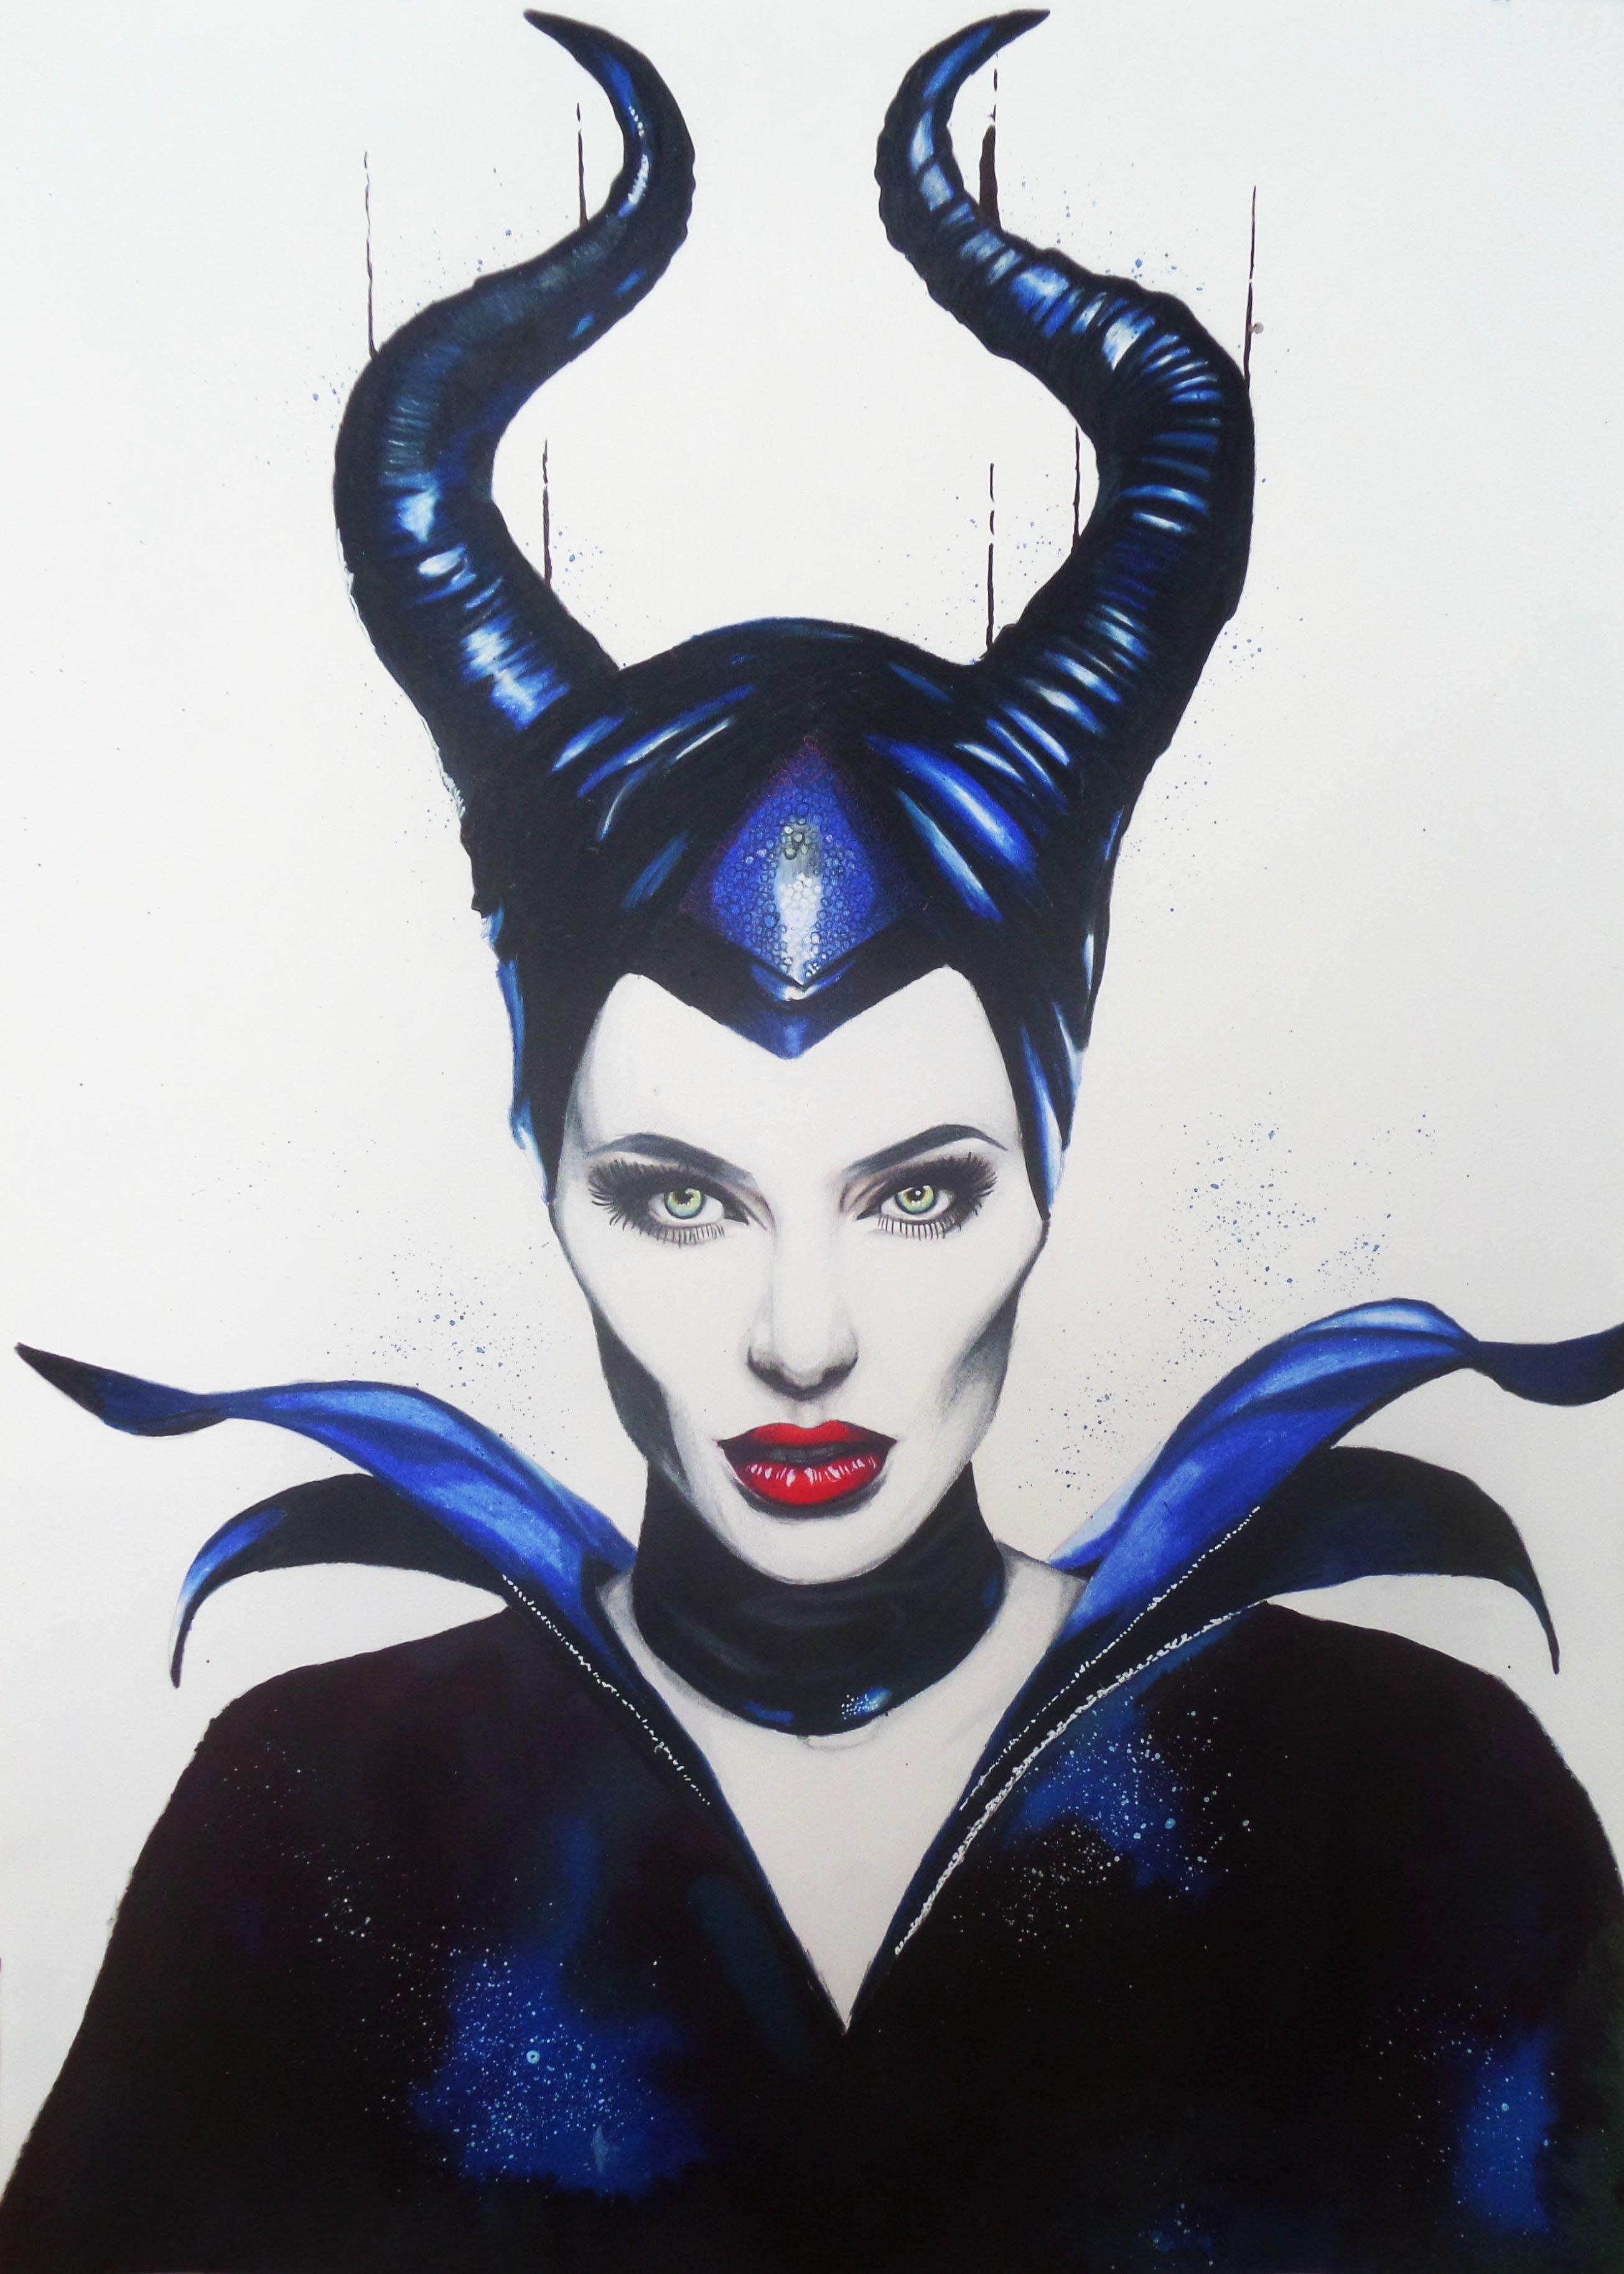 Maleficent Colored Pencils On Winsor And Newton Paper Dibujos Dibujos A Lapiz Tumblr Ilustraciones